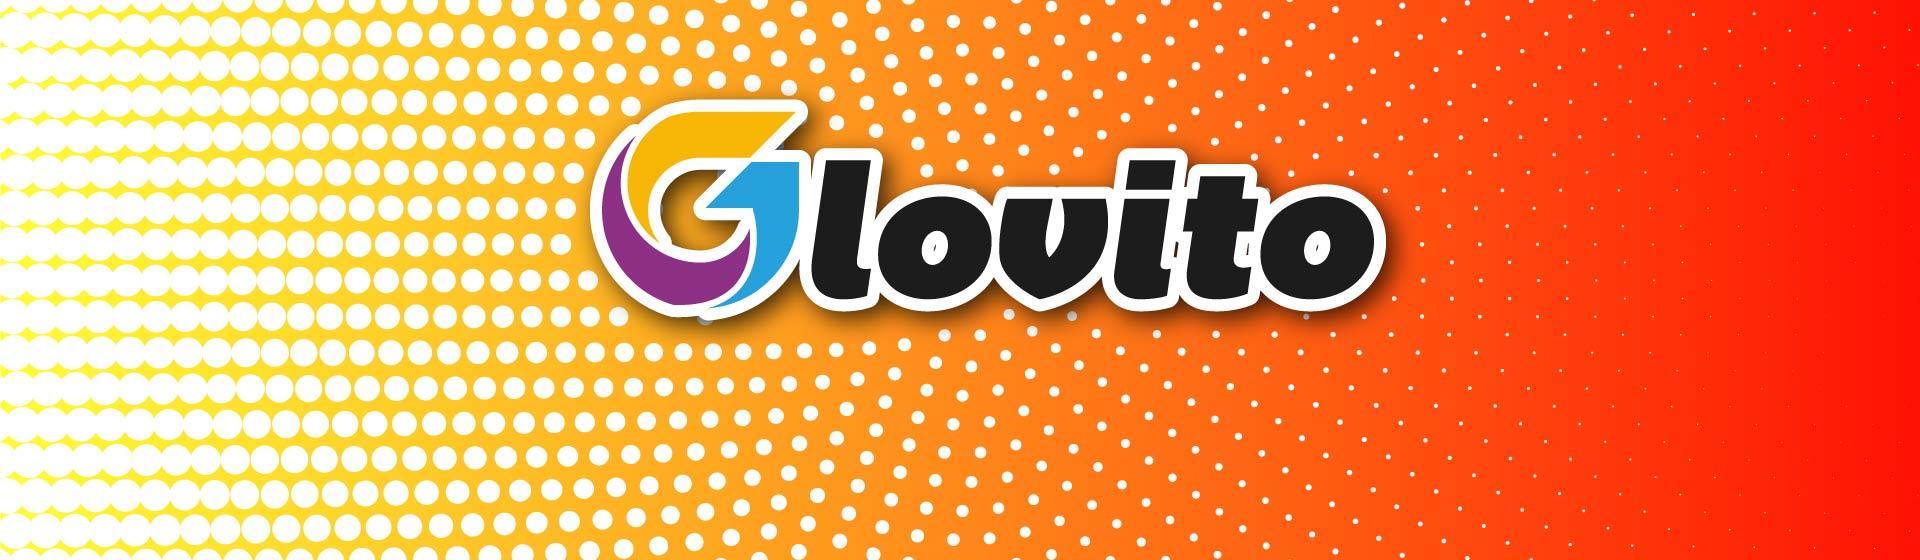 Glovito.com Brand Name